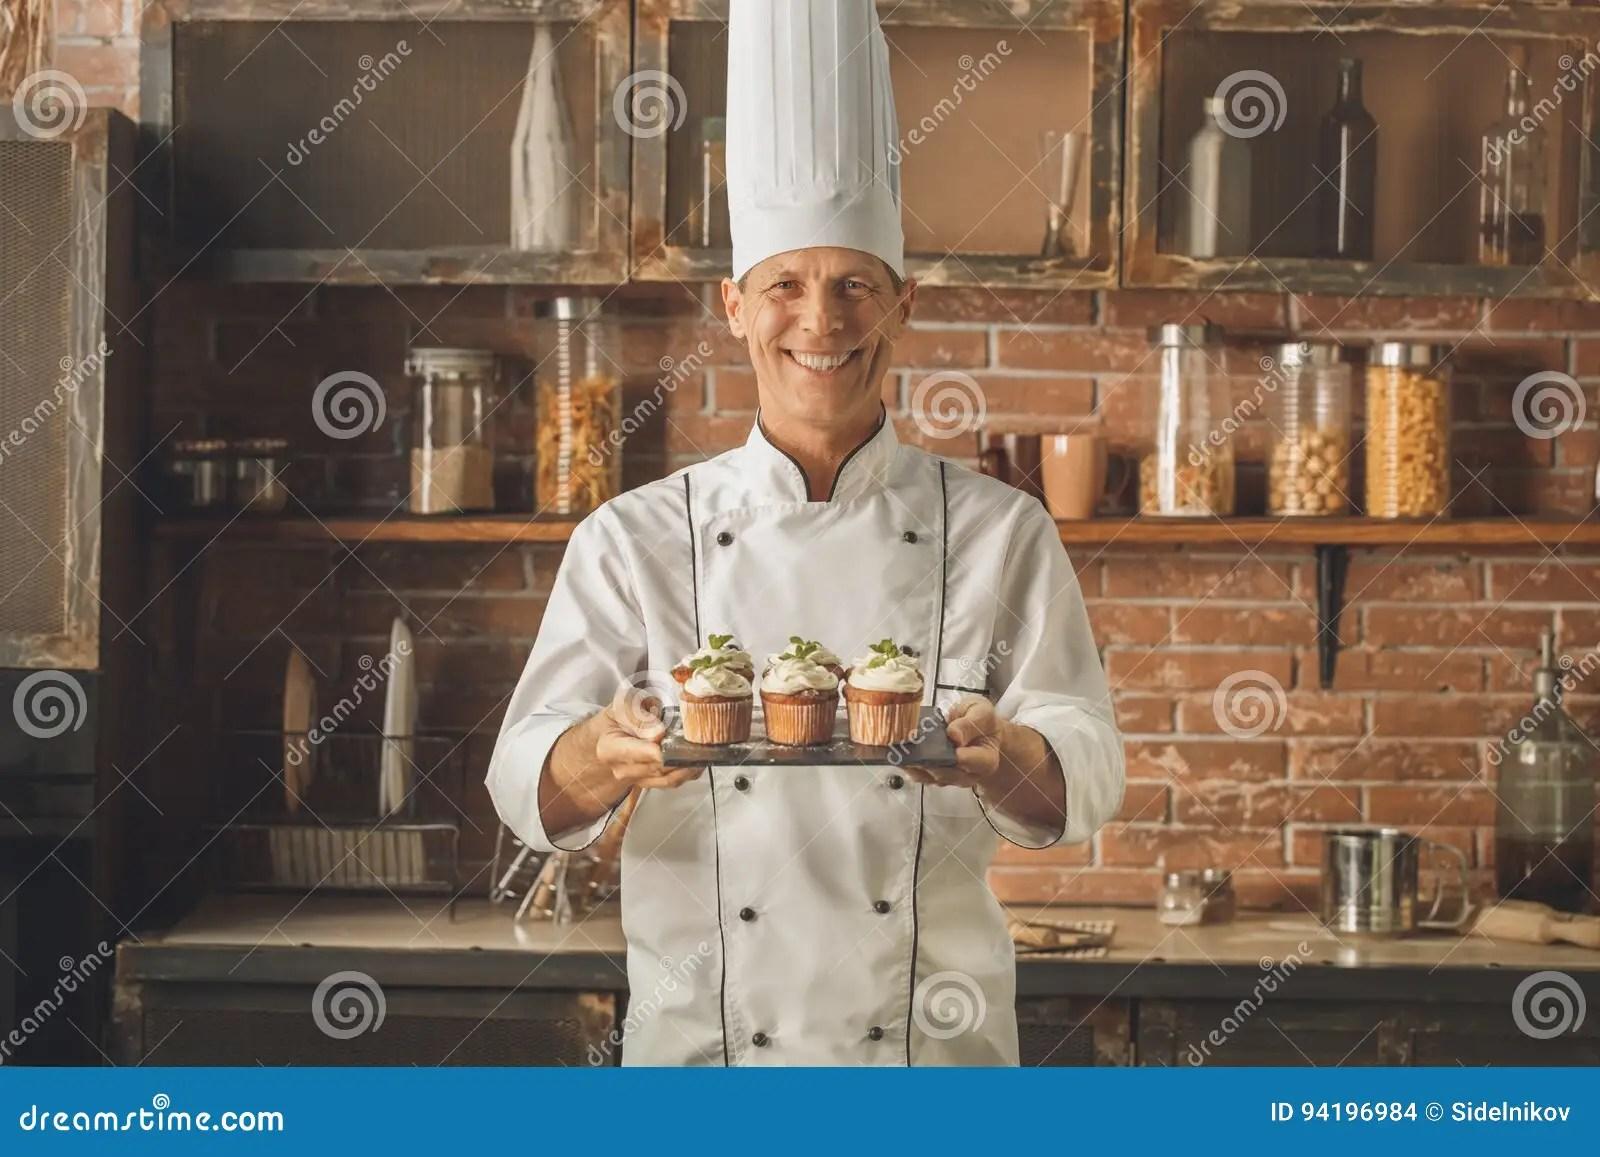 kitchen experts apron for kids 面包店厨师烹调在厨房专家烘烤库存照片 图片包括有准备 bacterias 面包店厨师烹调在厨房专家烘烤